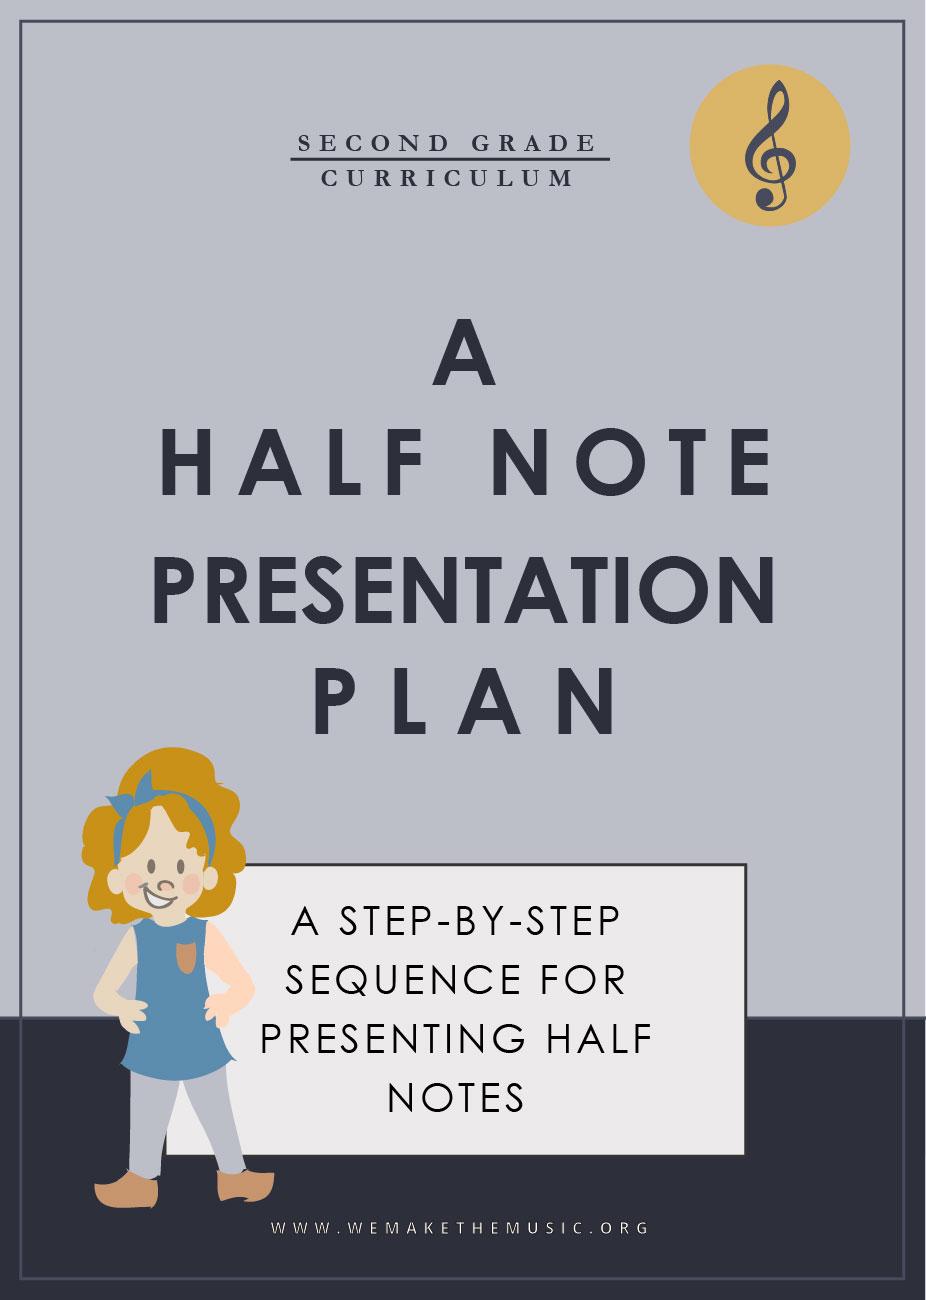 half note presentation_5-15 Half Note Presentation.jpg